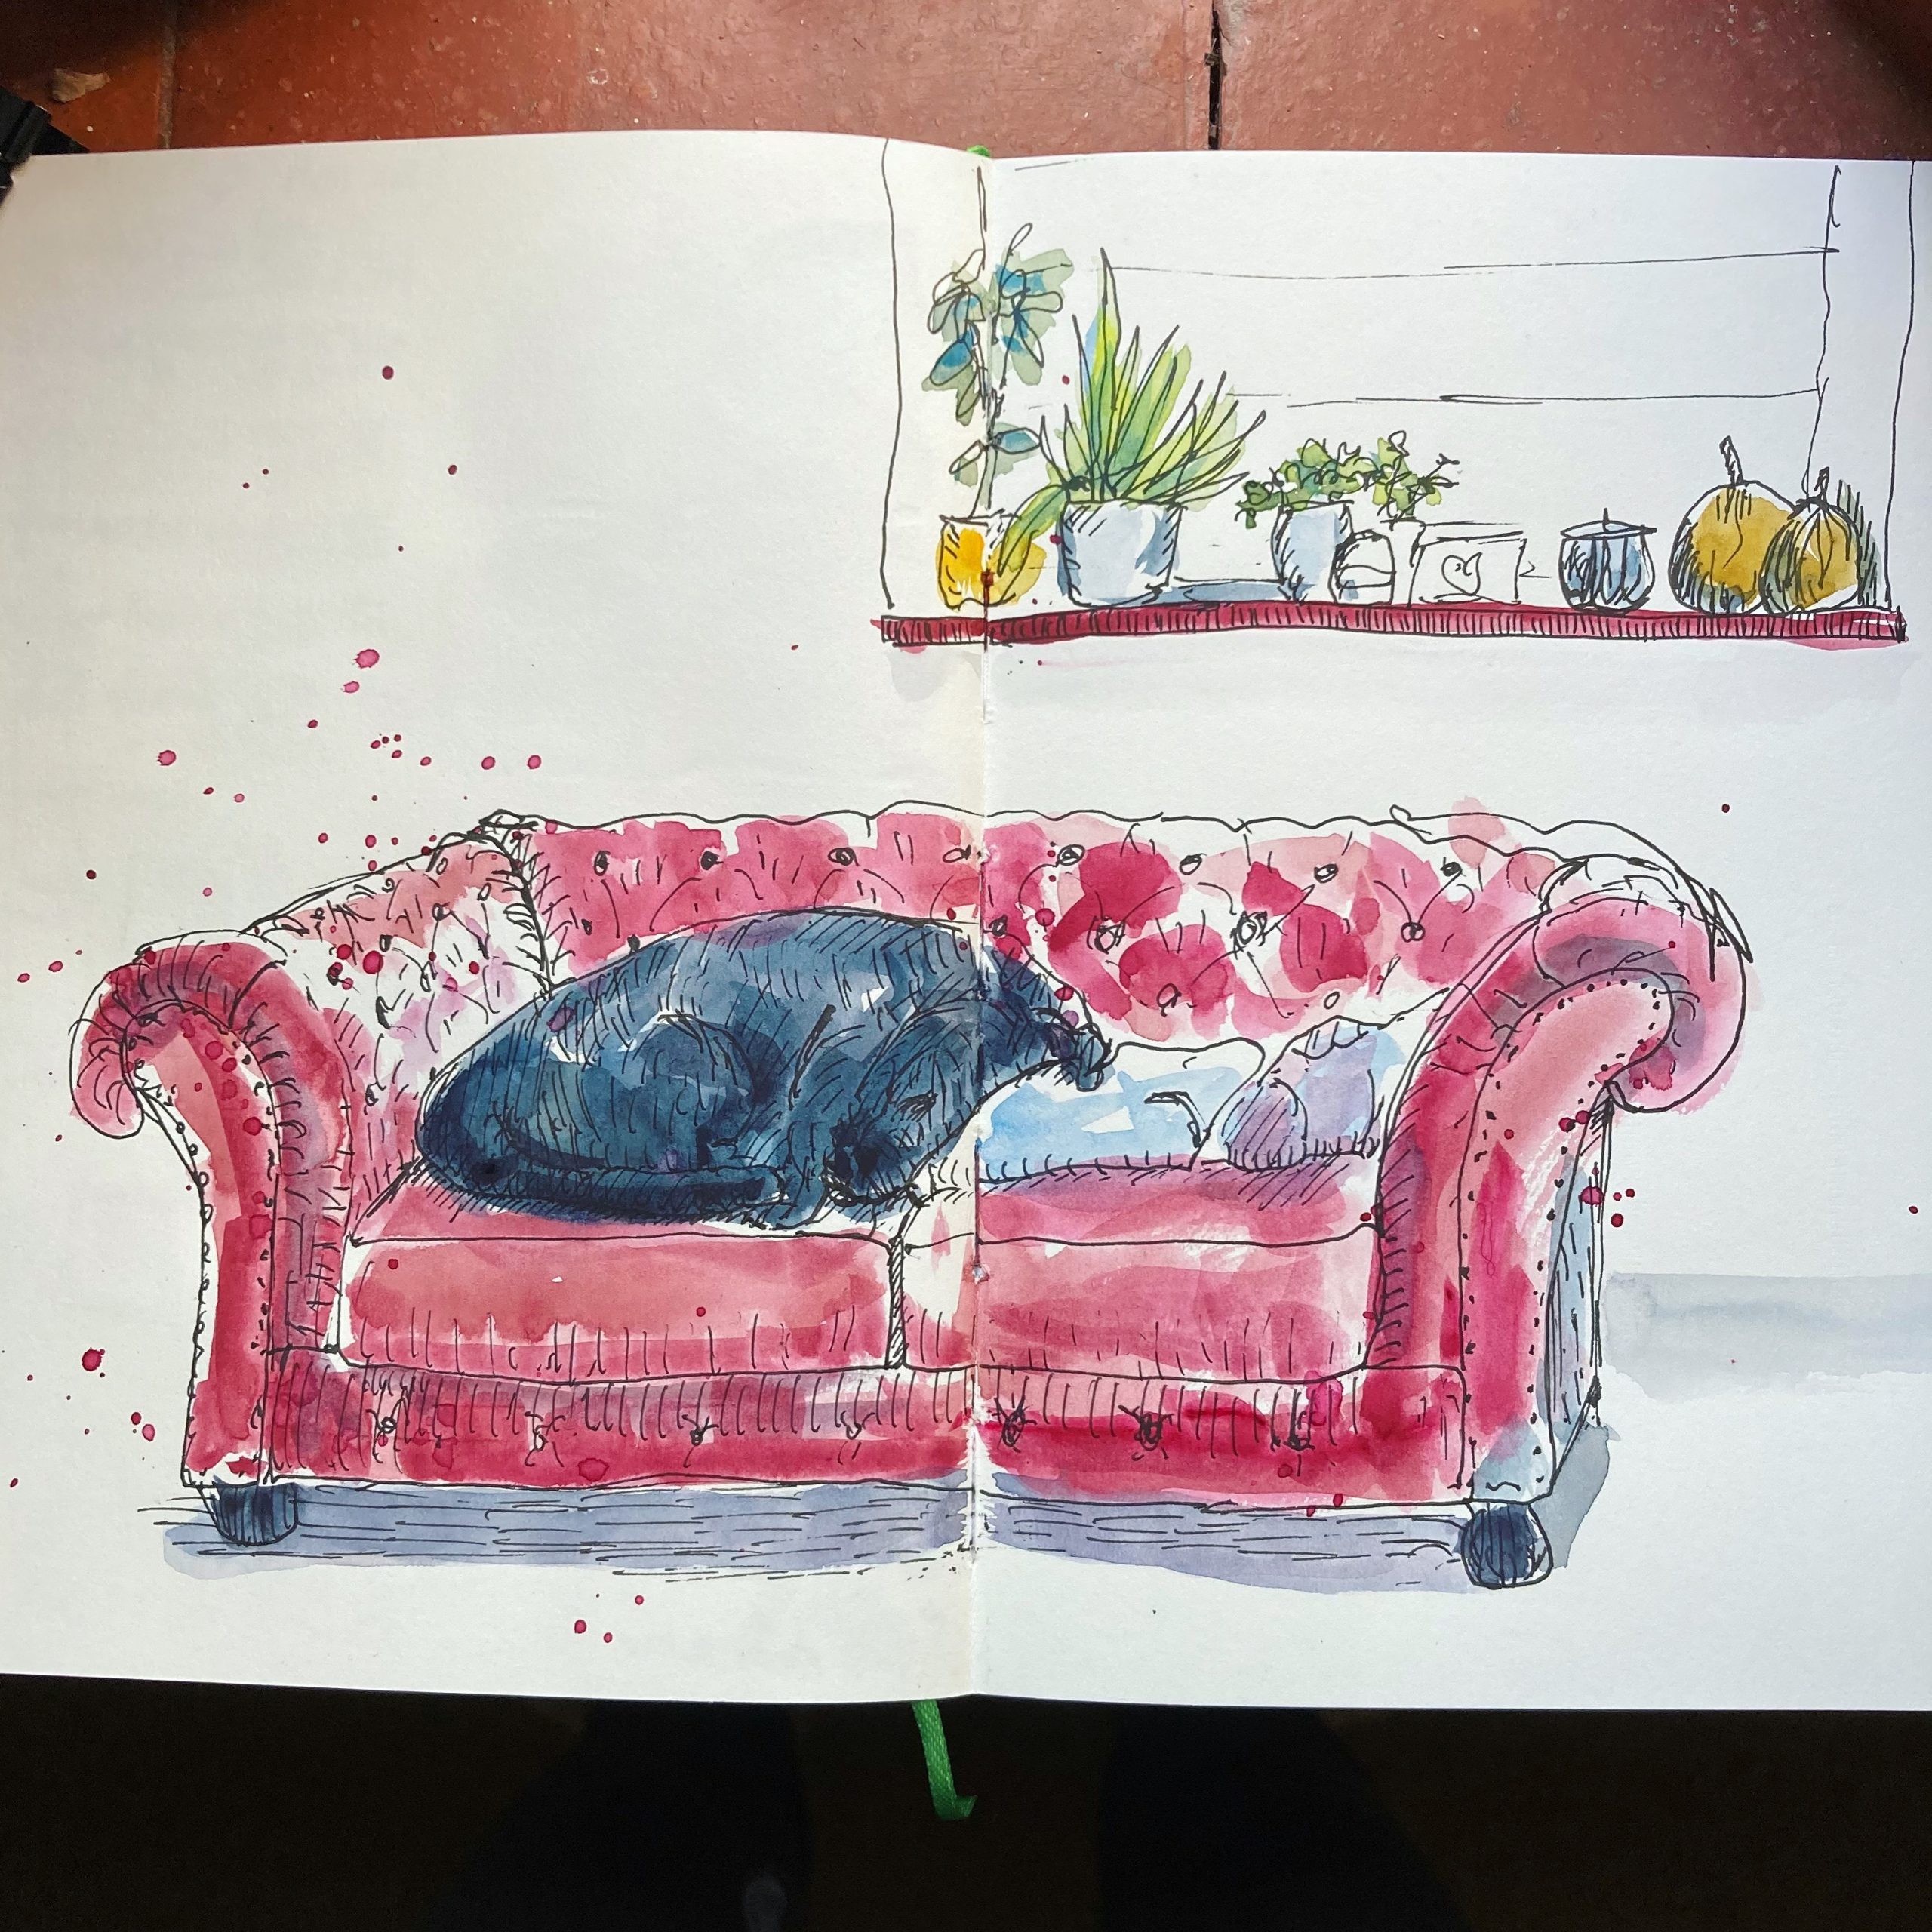 Morning Sketch of Ruby